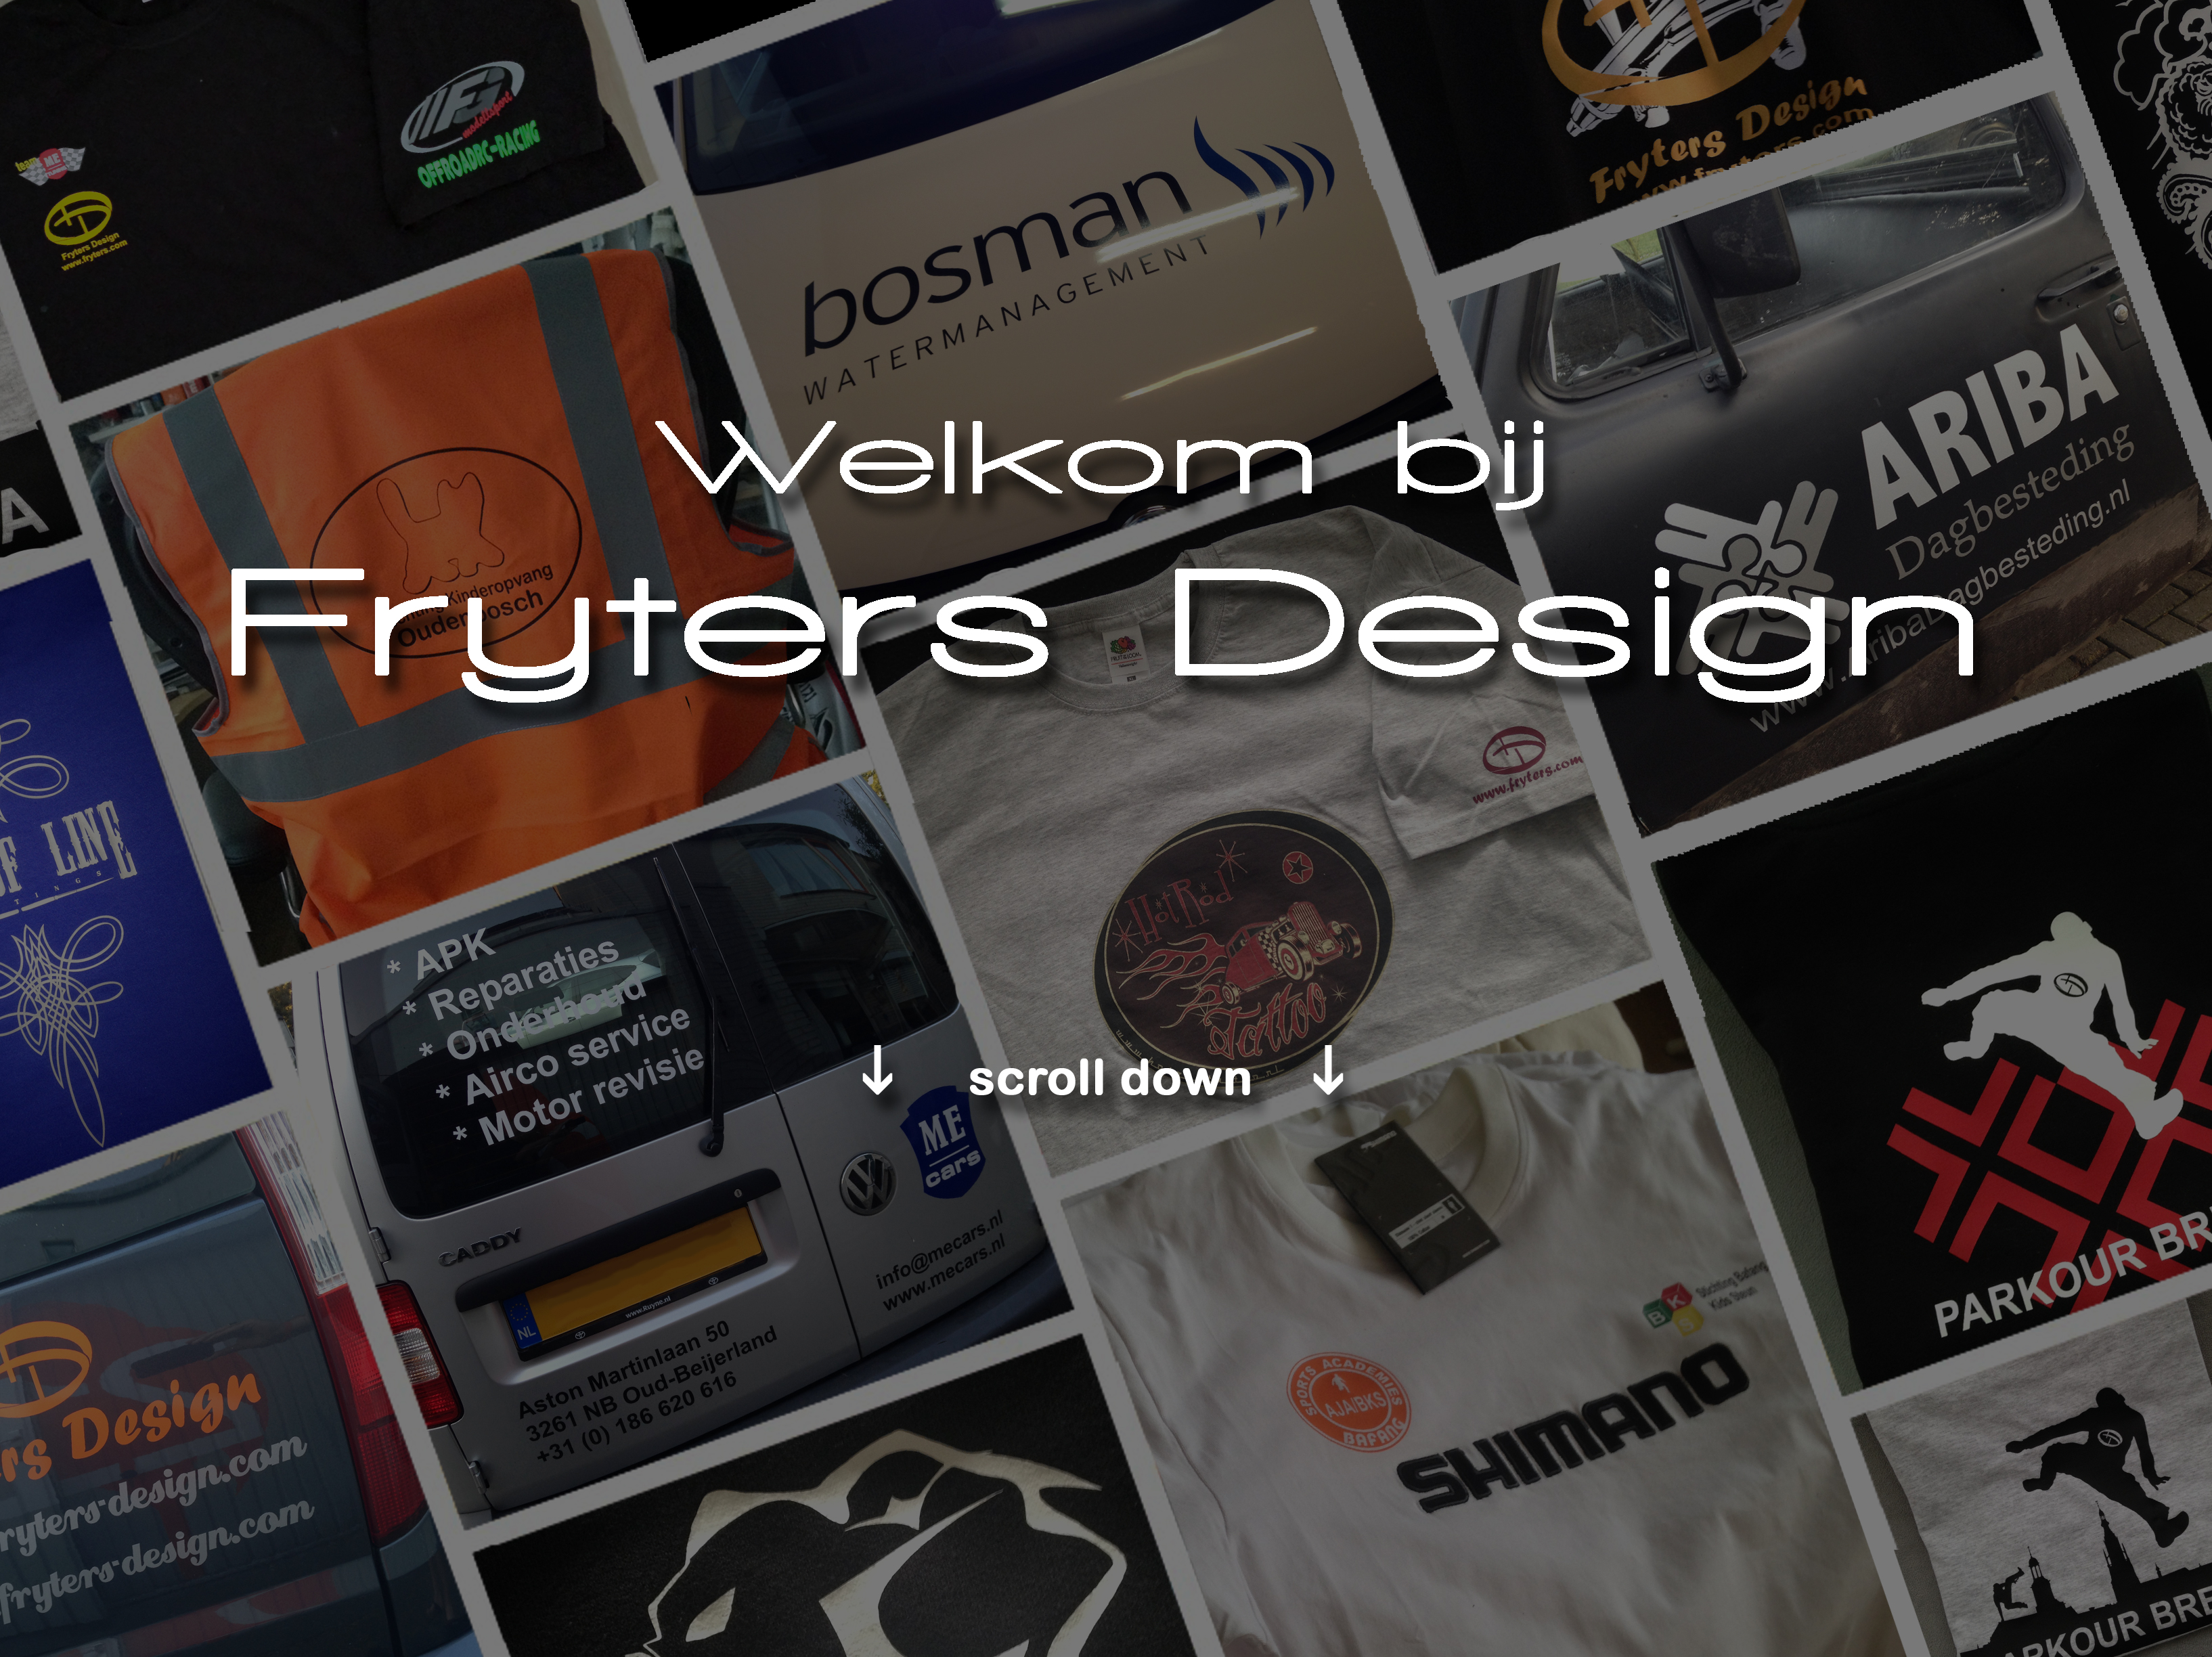 Fryters Design header